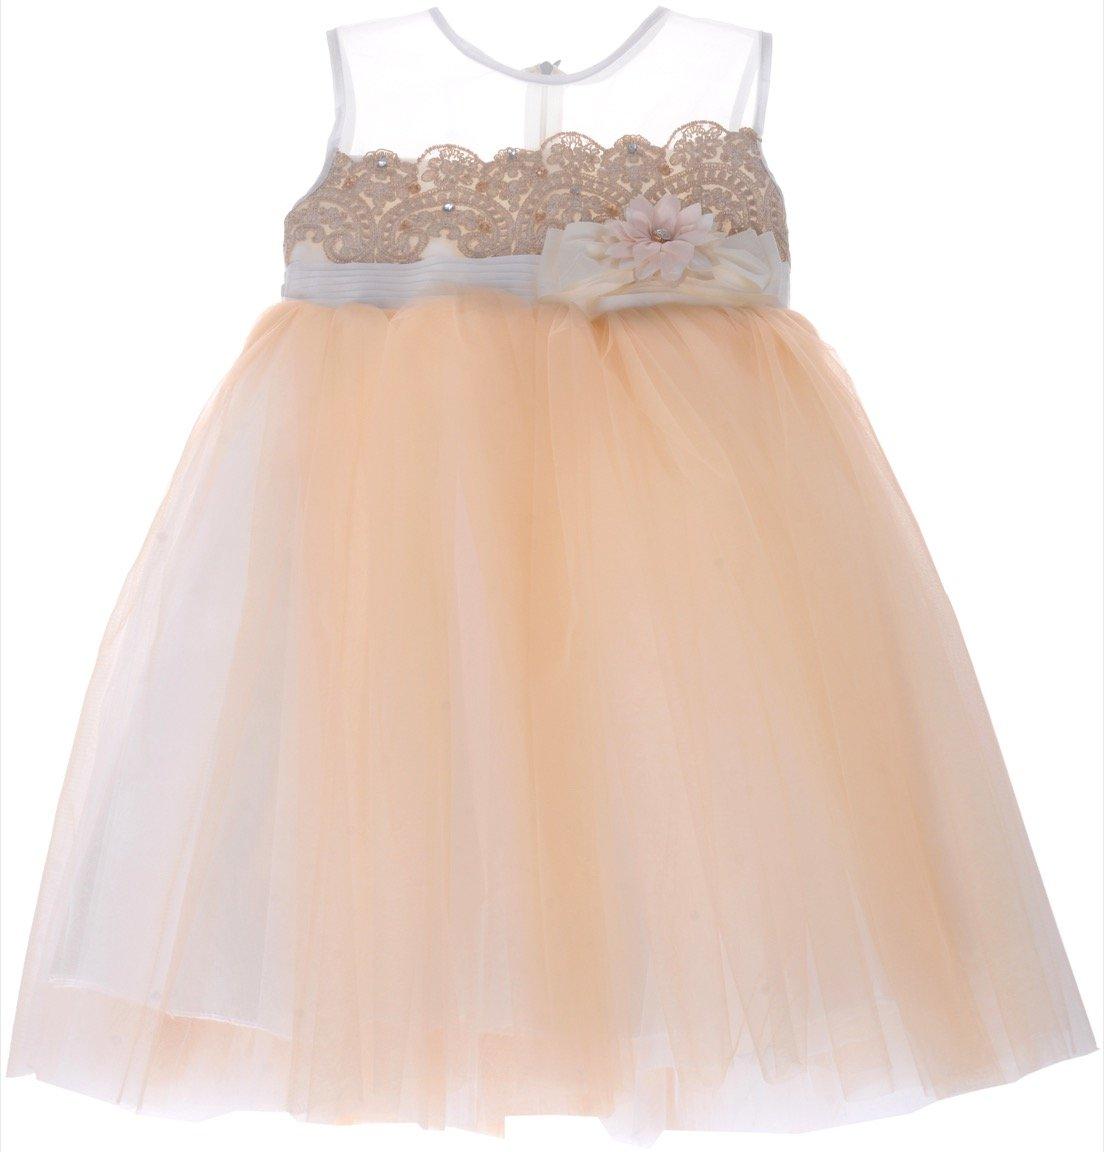 Jojomama παιδικό αμπιγιέ φόρεμα «Luminous» - Παιδικά ρούχα 907748481da